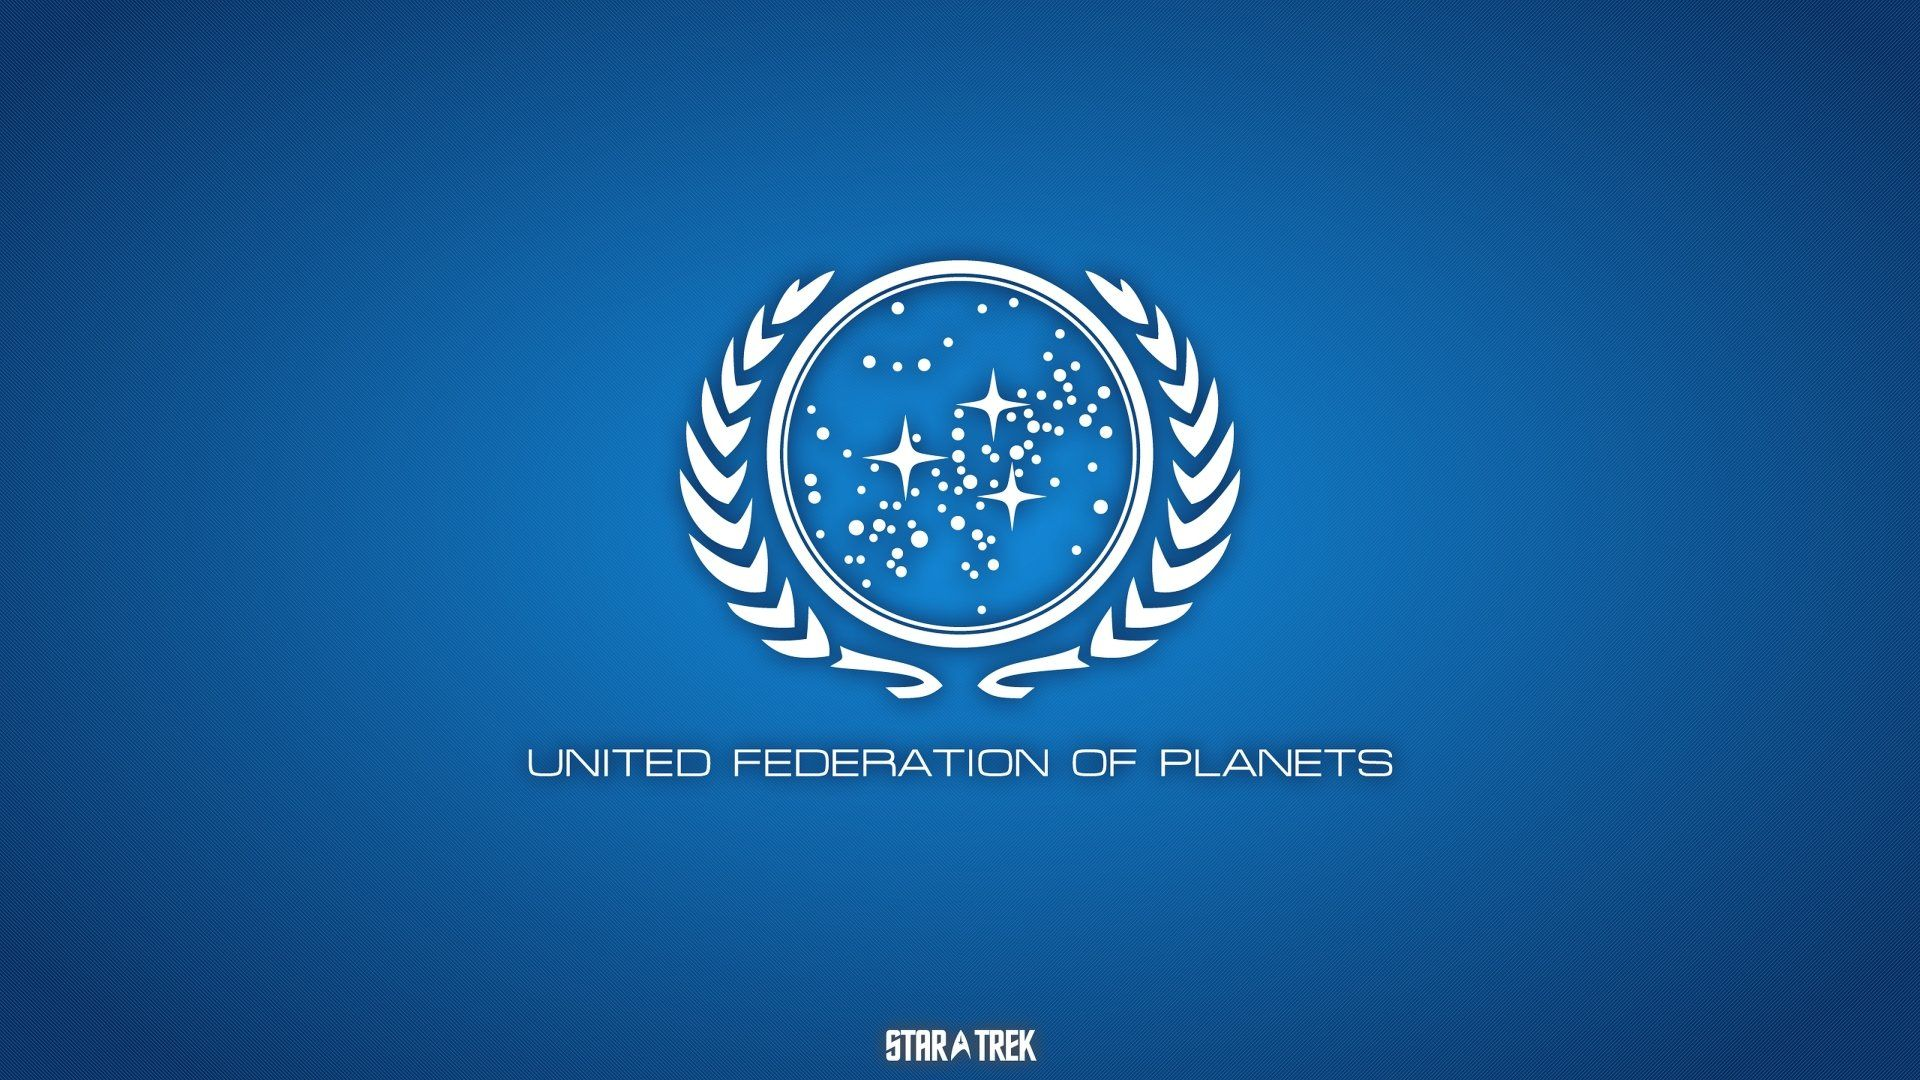 5120x2880 Star Trek Wallpaper Background Image View Download Comment And R Star Trek Wallpaper Star Trek Wallpaper Backgrounds United Federation Of Planets